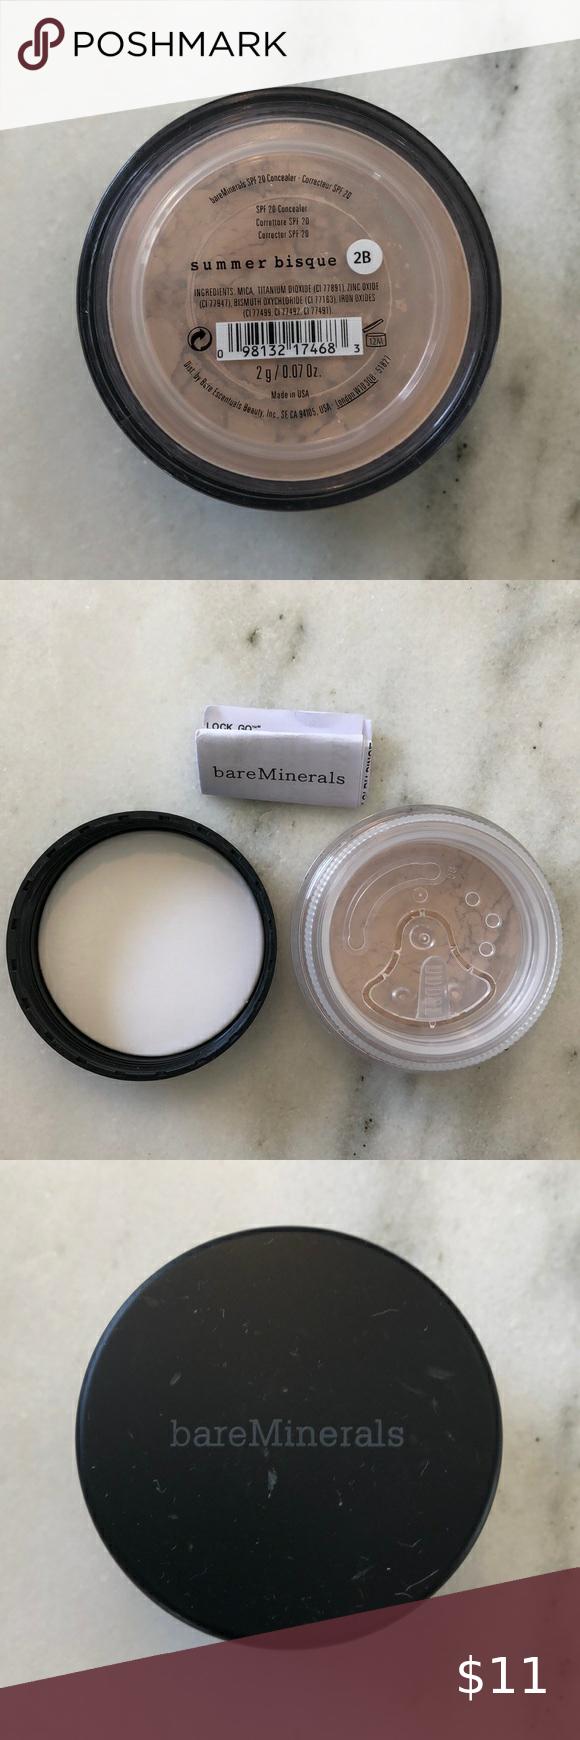 bare Minerals Loose Powder Concealer SPF 20 Boutique in